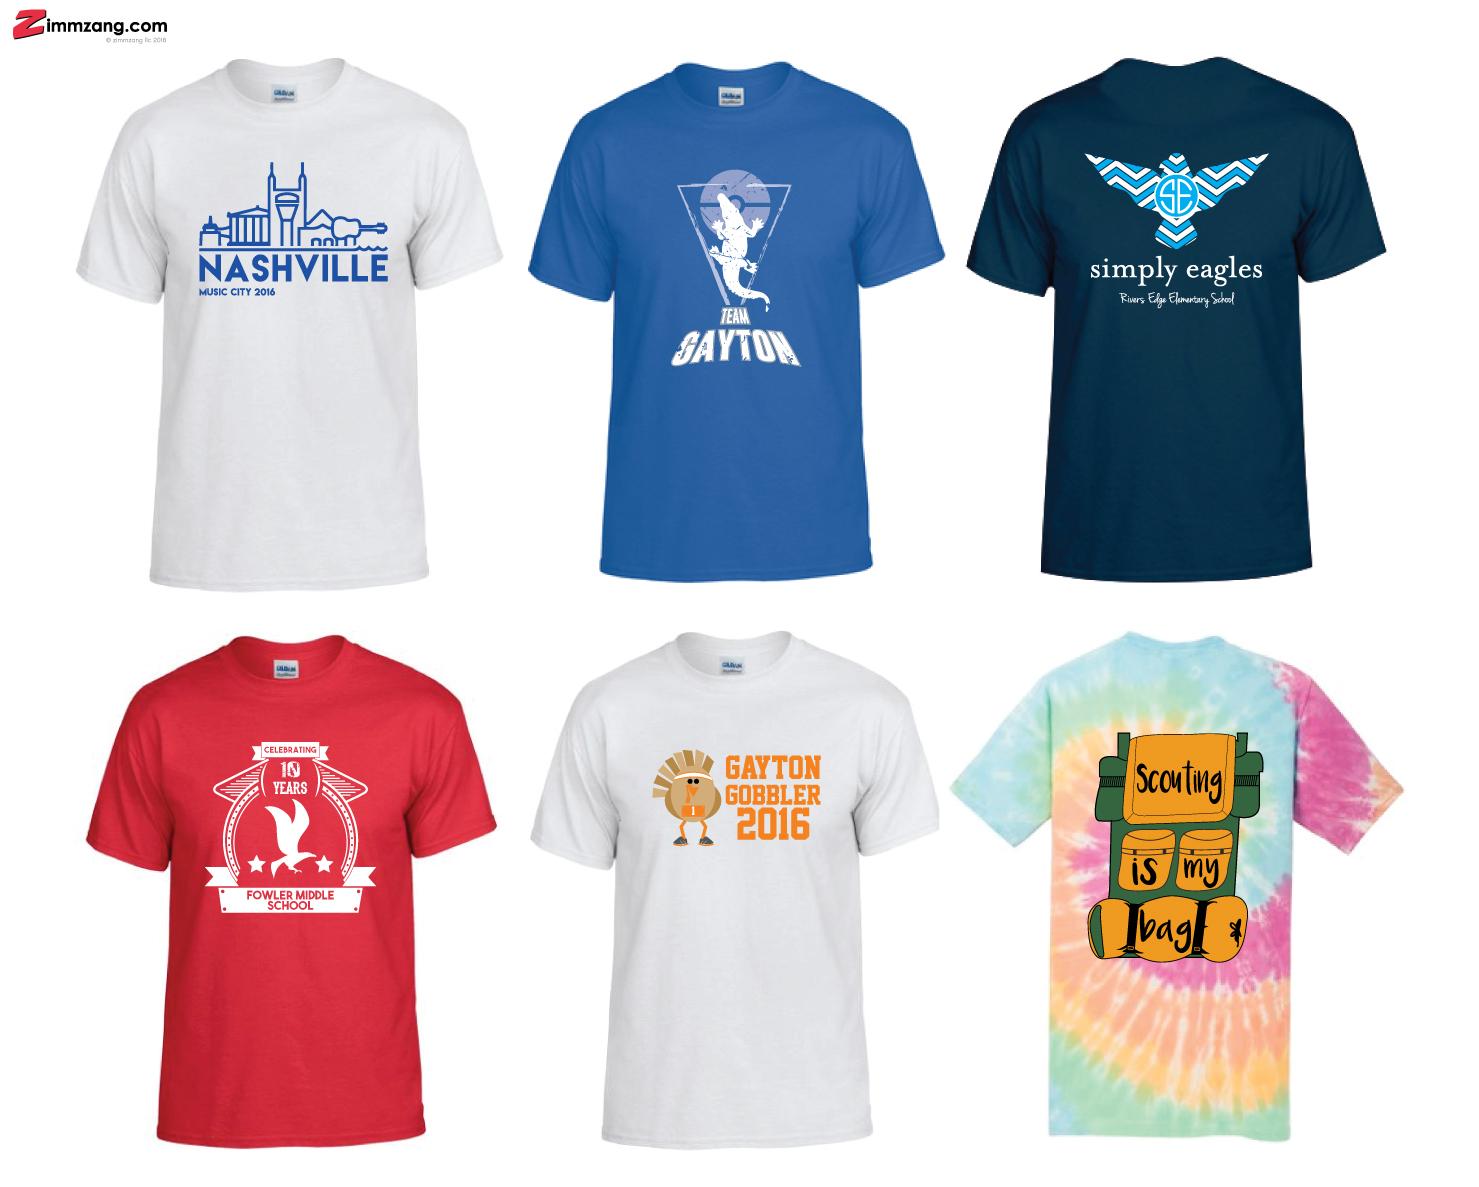 T-Shirt Design Samples